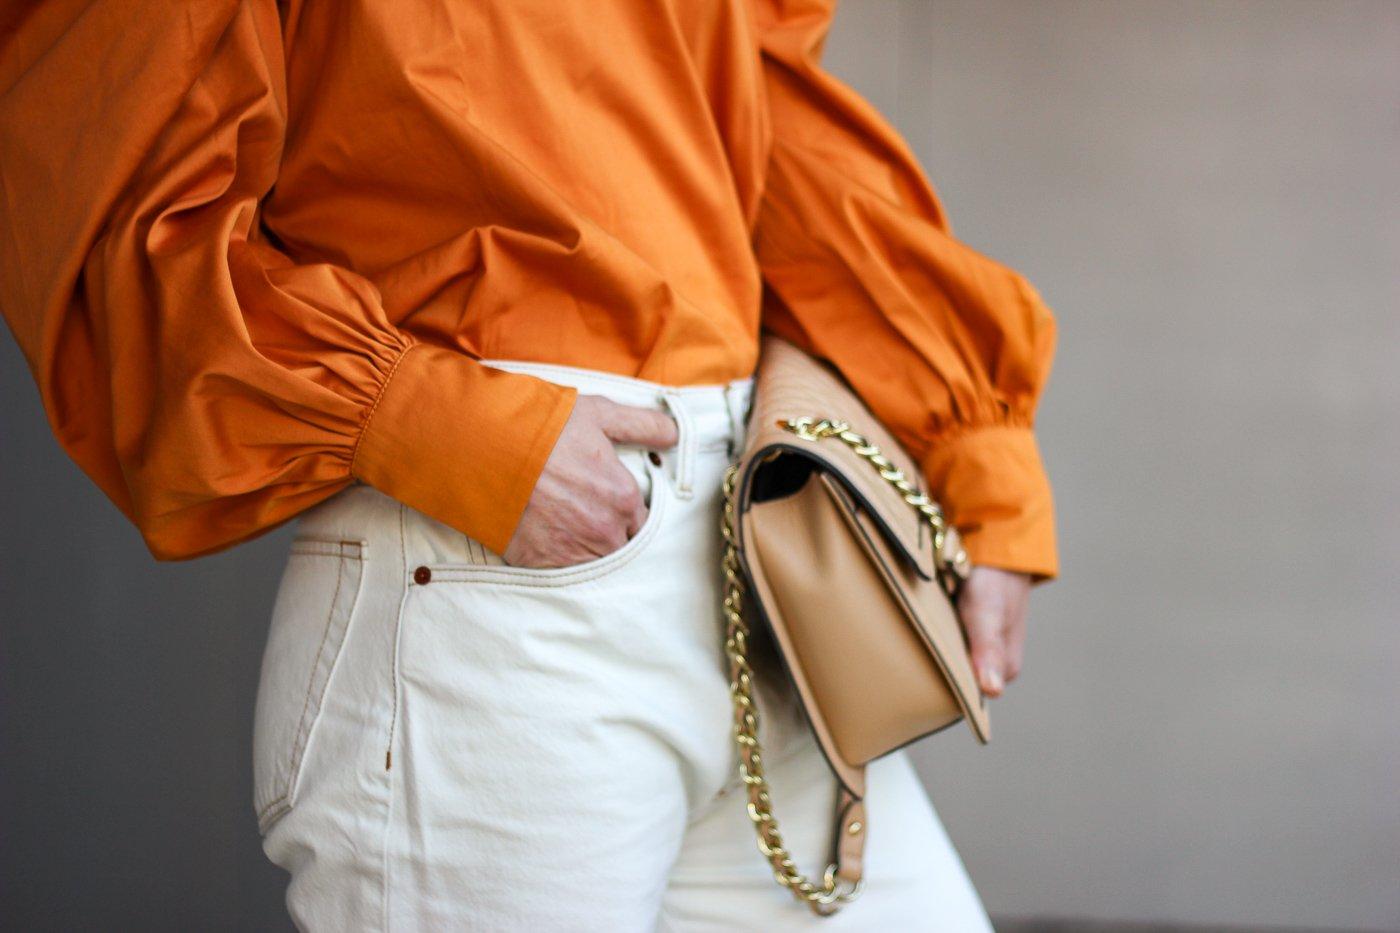 conny doll lifestyle: Bluse, Details, orange, nude, Denim